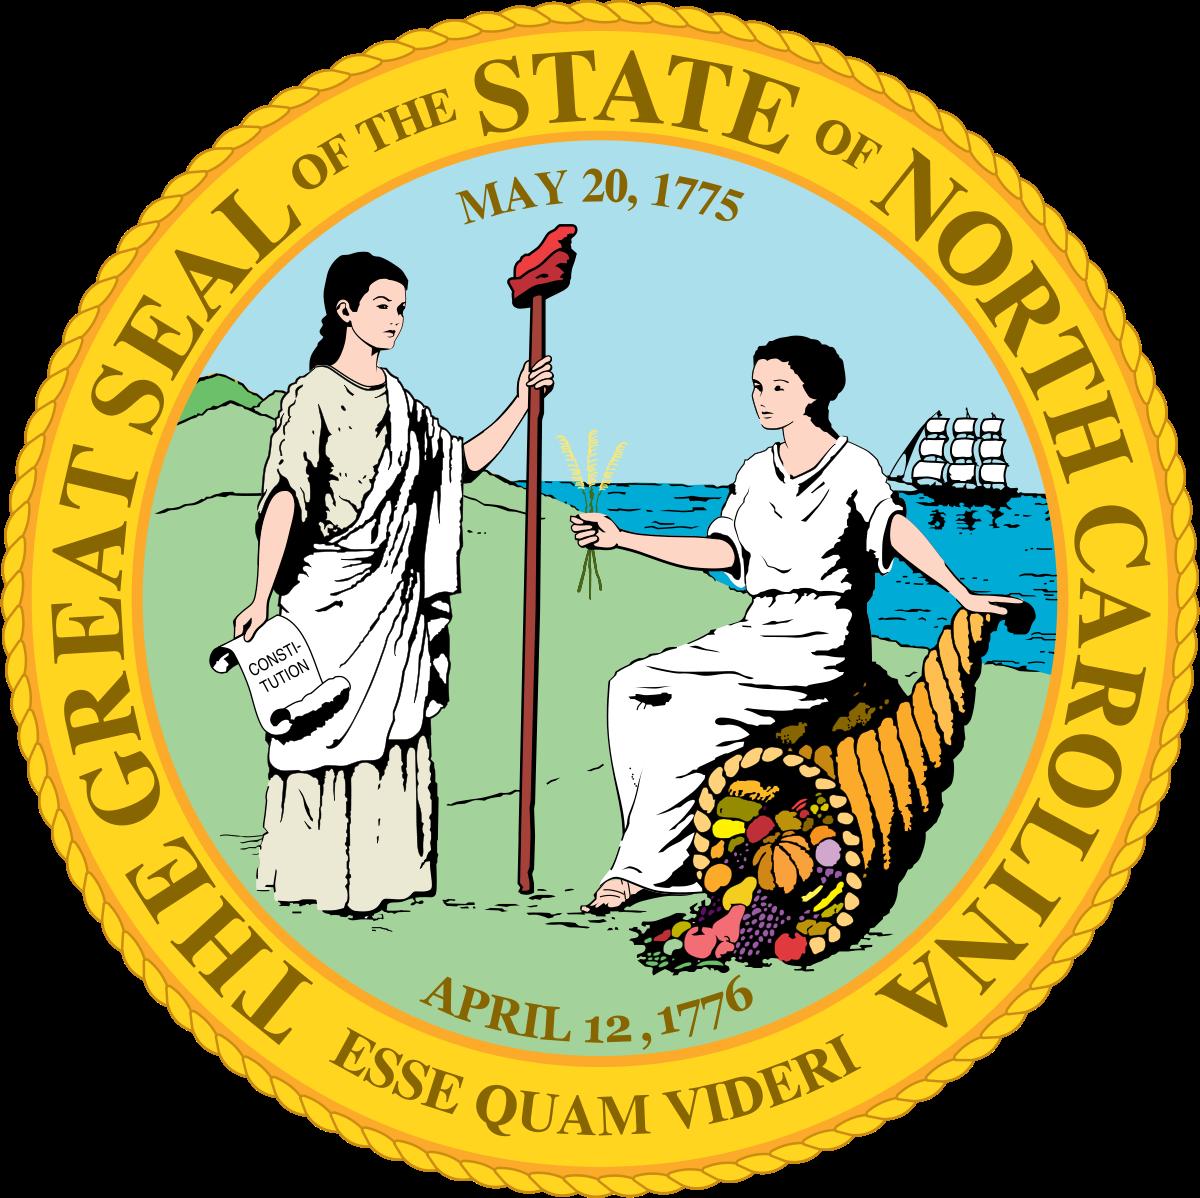 Virginia house of burgesses clipart clip art North Carolina General Assembly - Wikipedia clip art